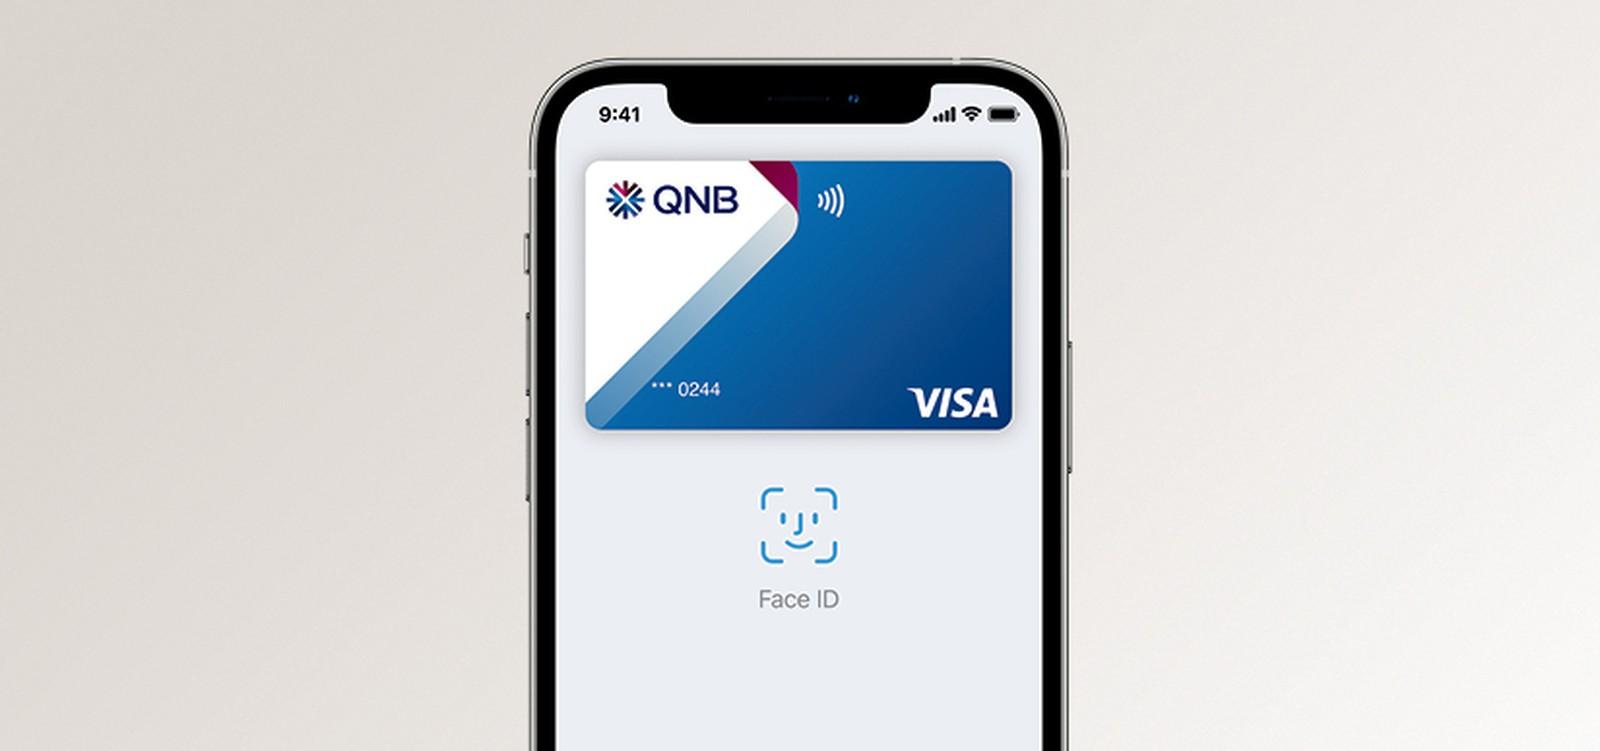 Apple Pay在卡塔尔正式推出 首先与QNB集团合作